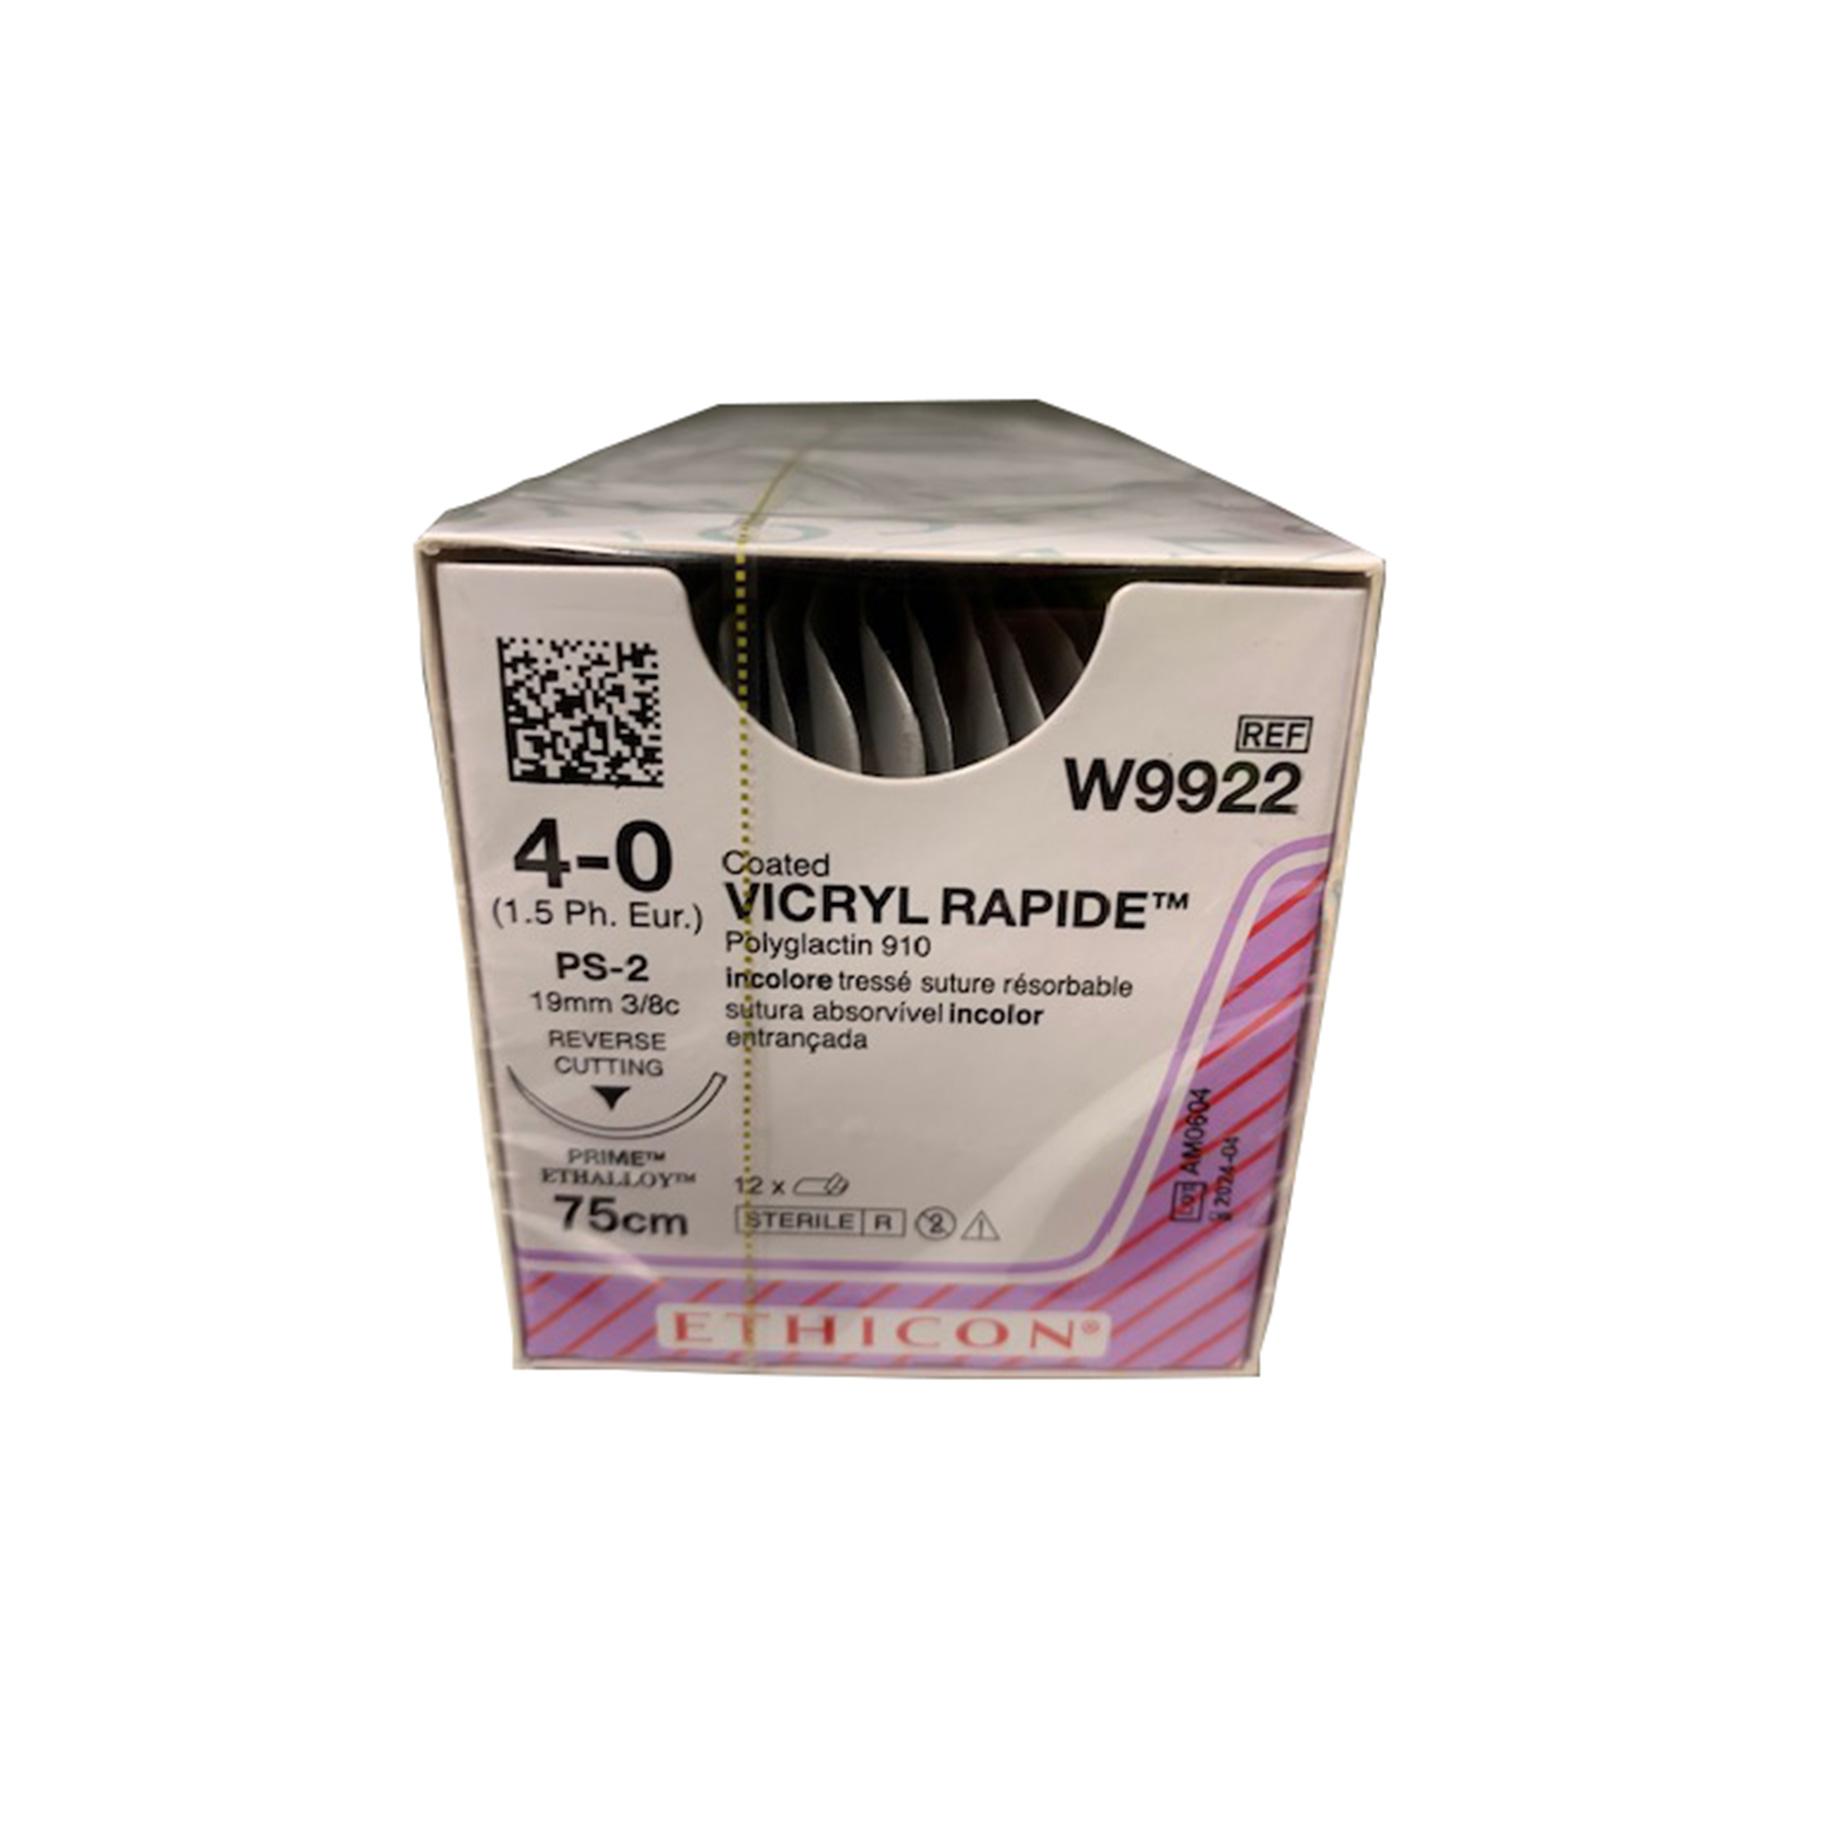 Vicryl Rapide Suture W9922 4/0 Gauge Box 12